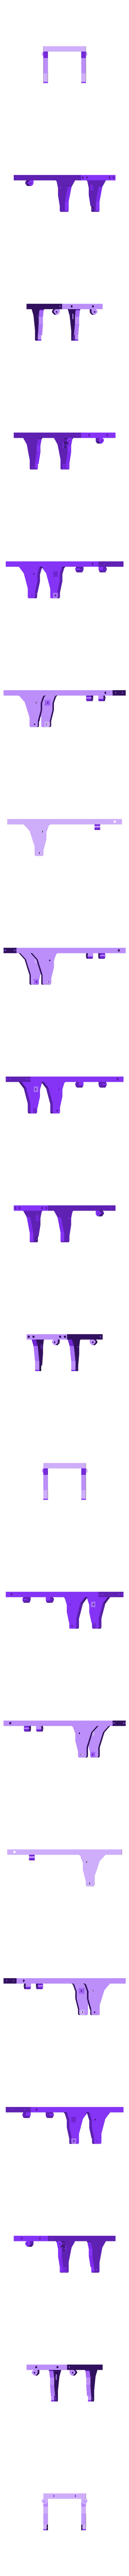 TruckV3_Rearframe1.STL Download STL file 3D Printed RC Truck V3 • 3D print model, MrCrankyface